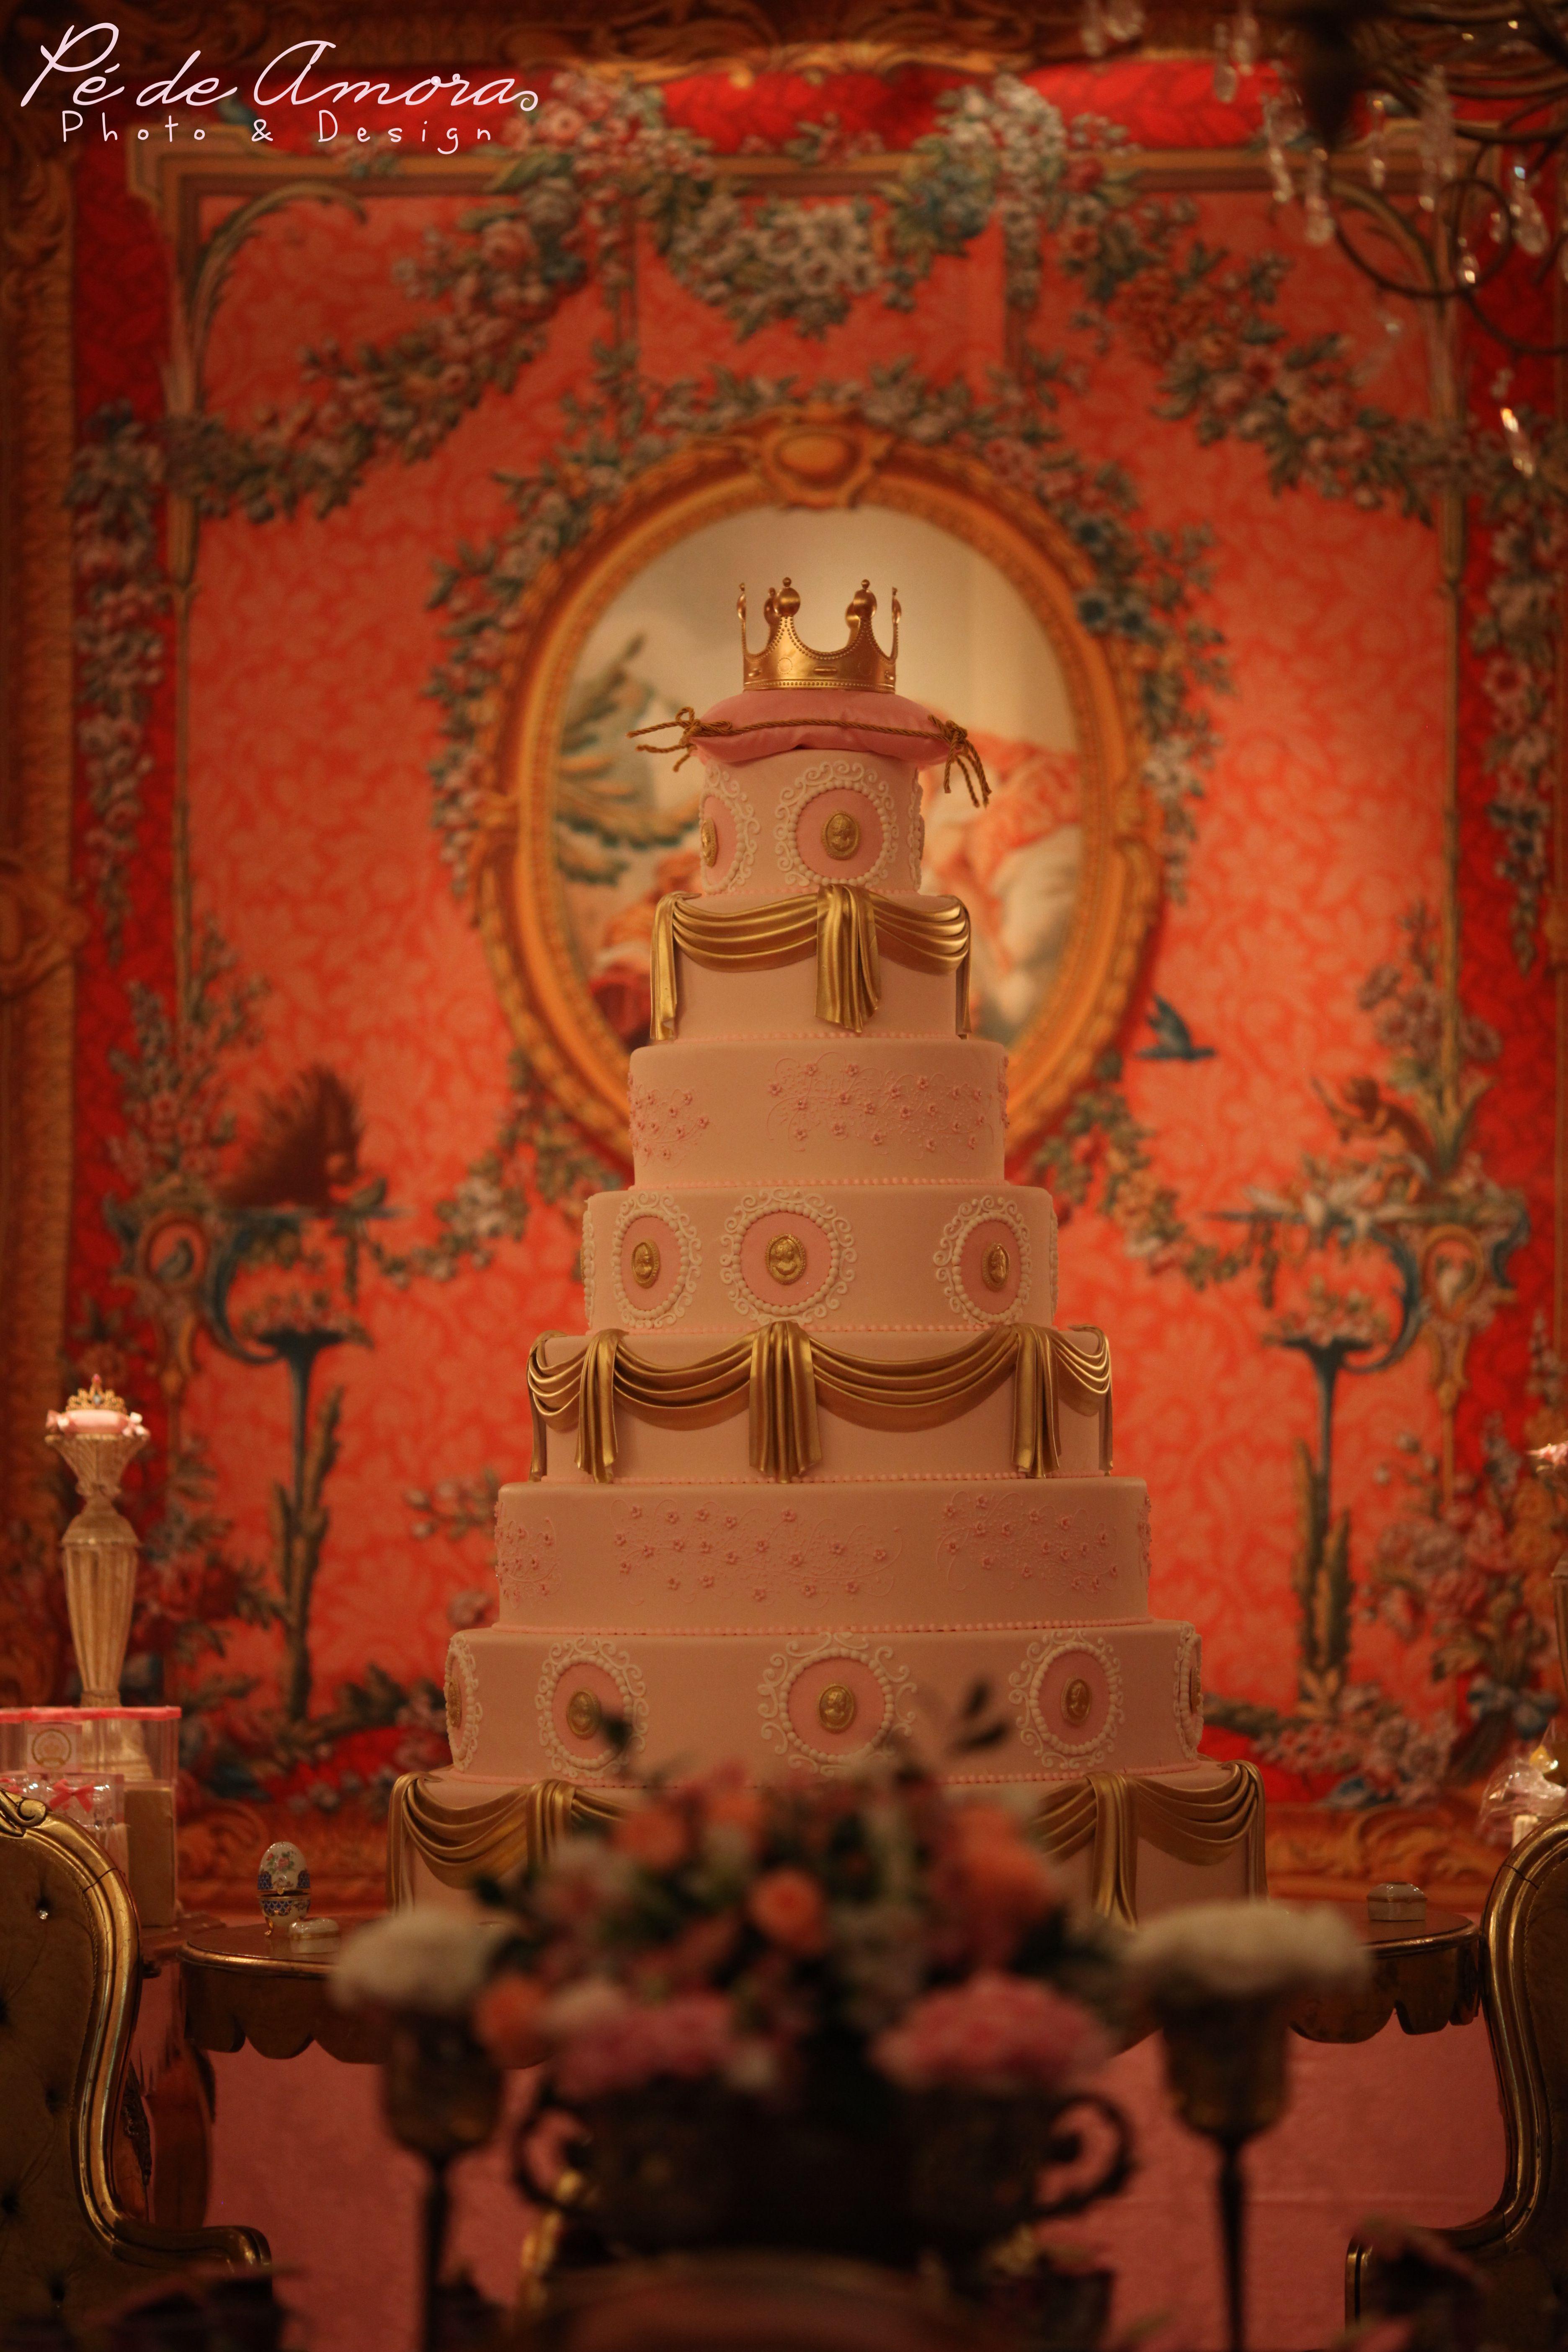 Decoracao fazendinha luxo bolo falso ccs decoracoes eventos car - Festa Princesas De Luxo By Mabel Manzi E Splash Party